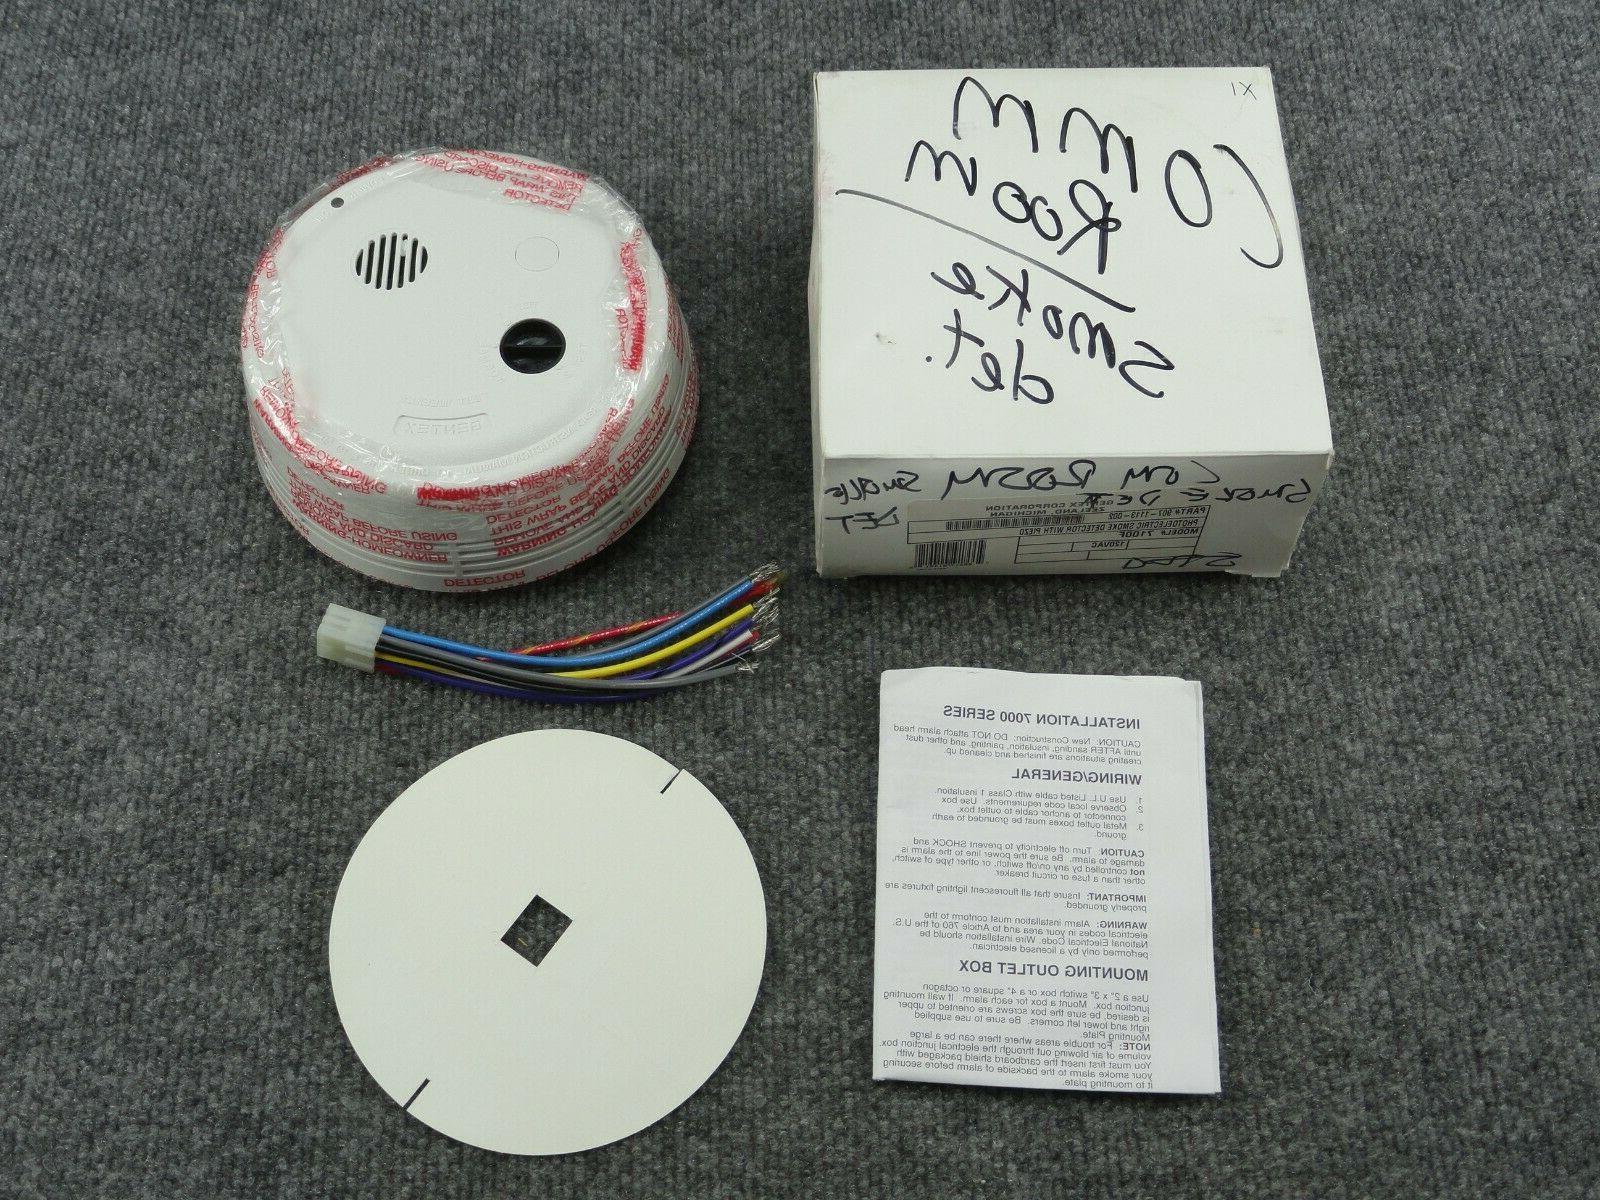 new 907 1113 002 photoelectric smoke detector